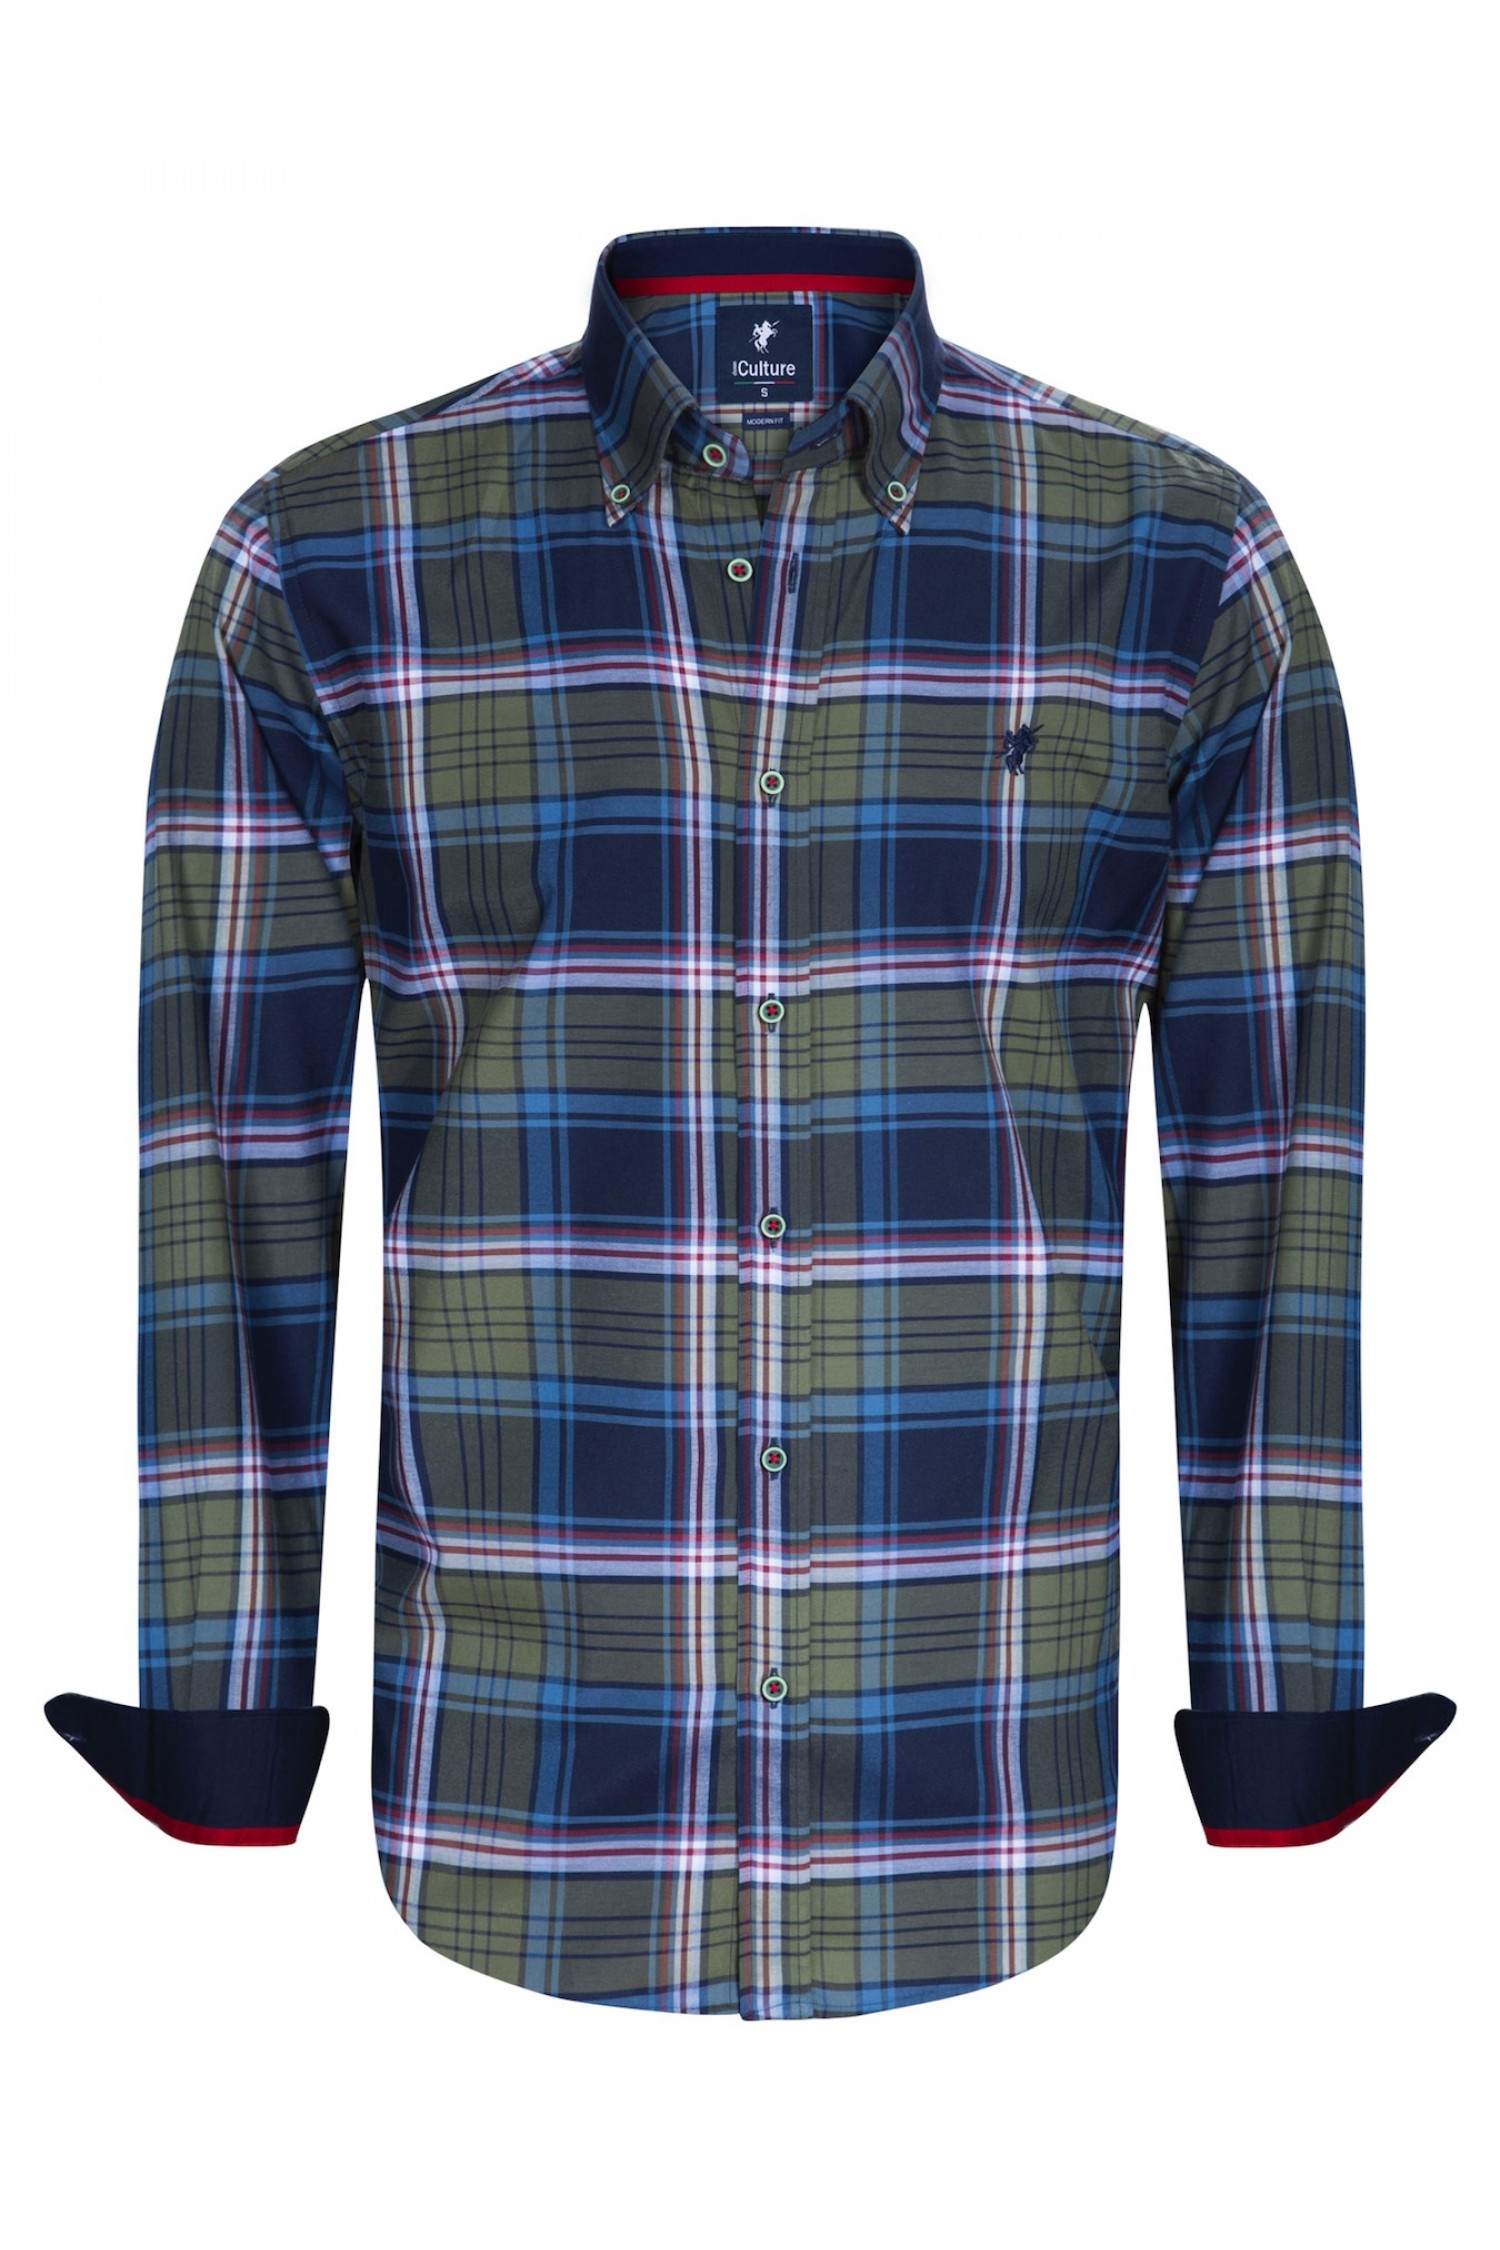 best service f8fbd 8fdd3 Herren Hemden Button Down Langarm KHAKI - Denim Culture